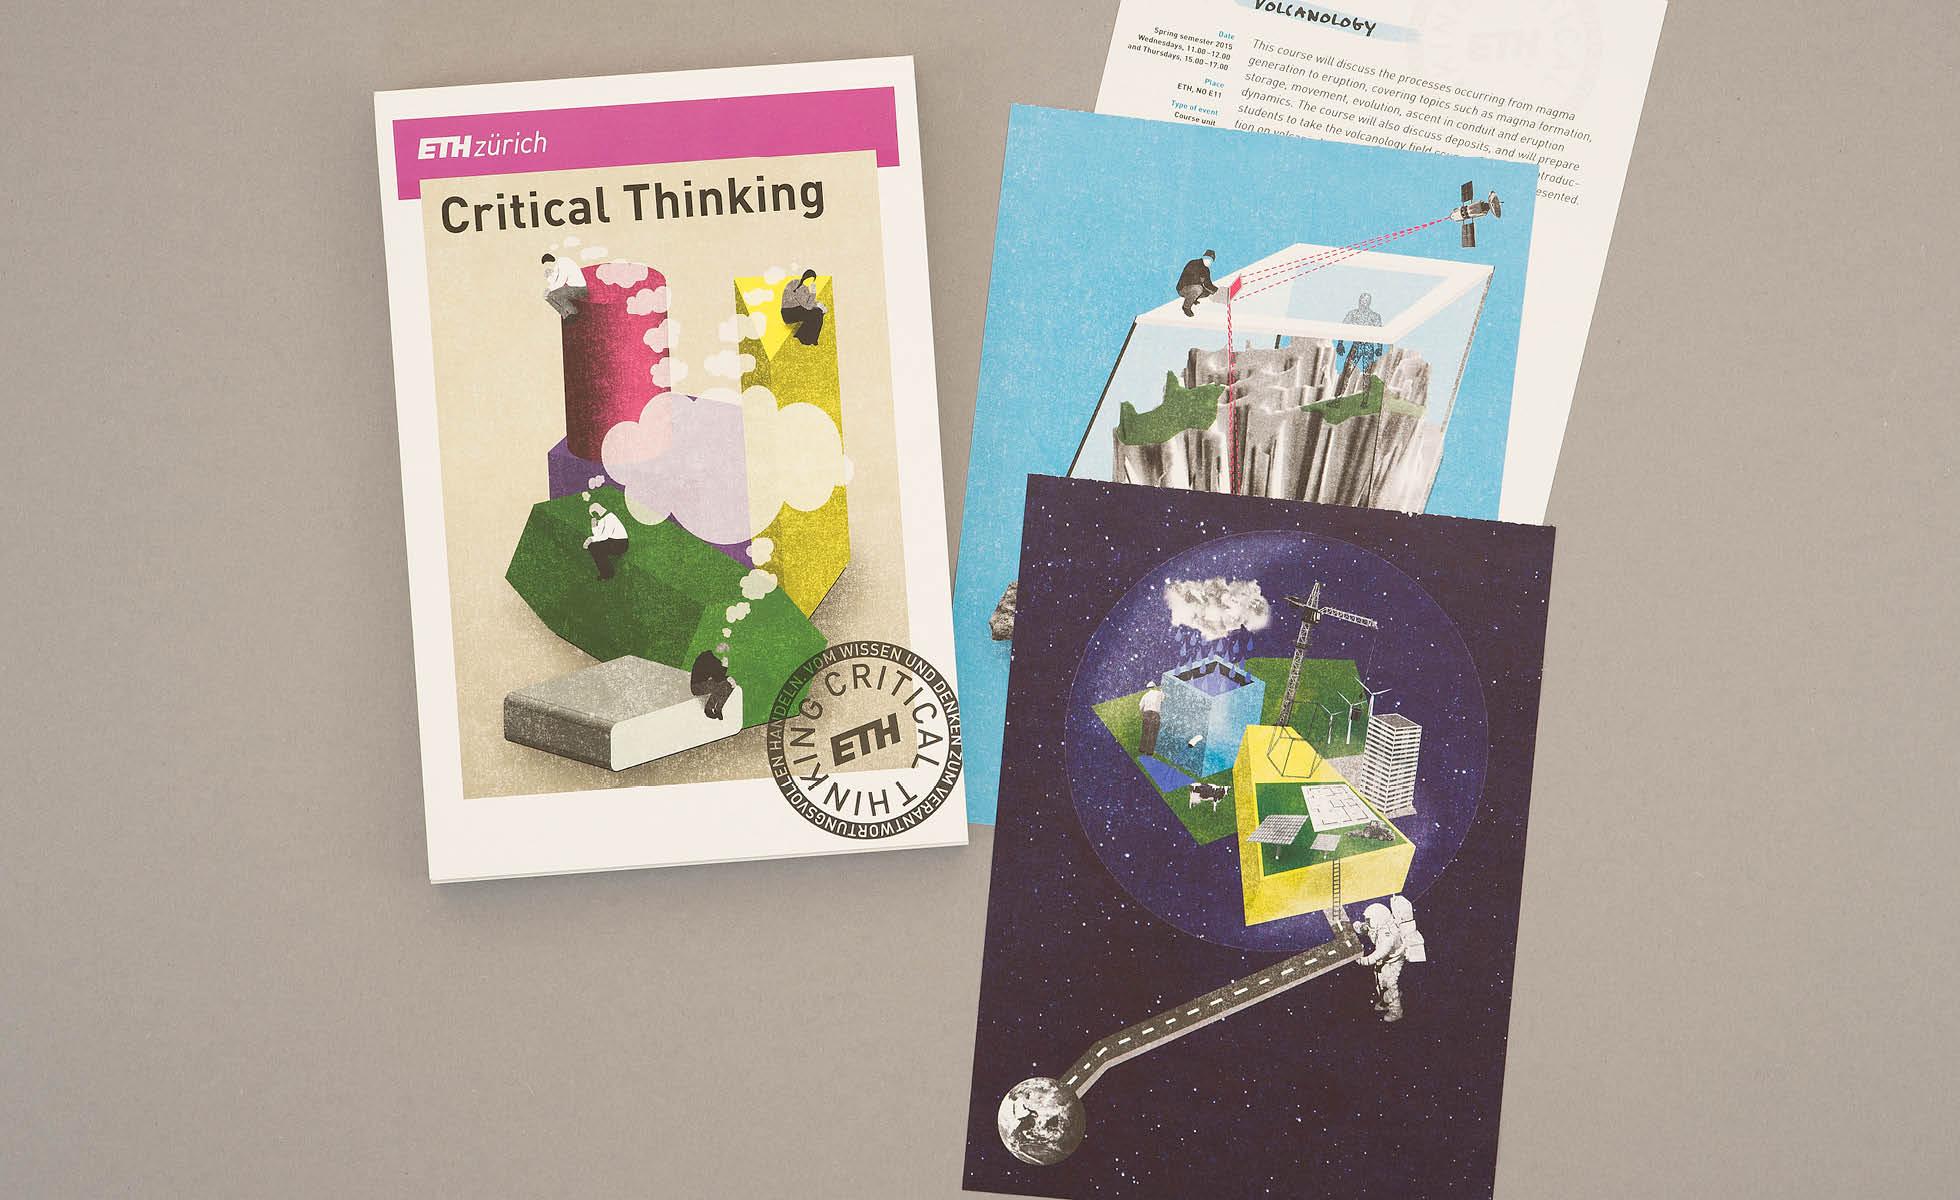 critical_thinking_01_eth_08